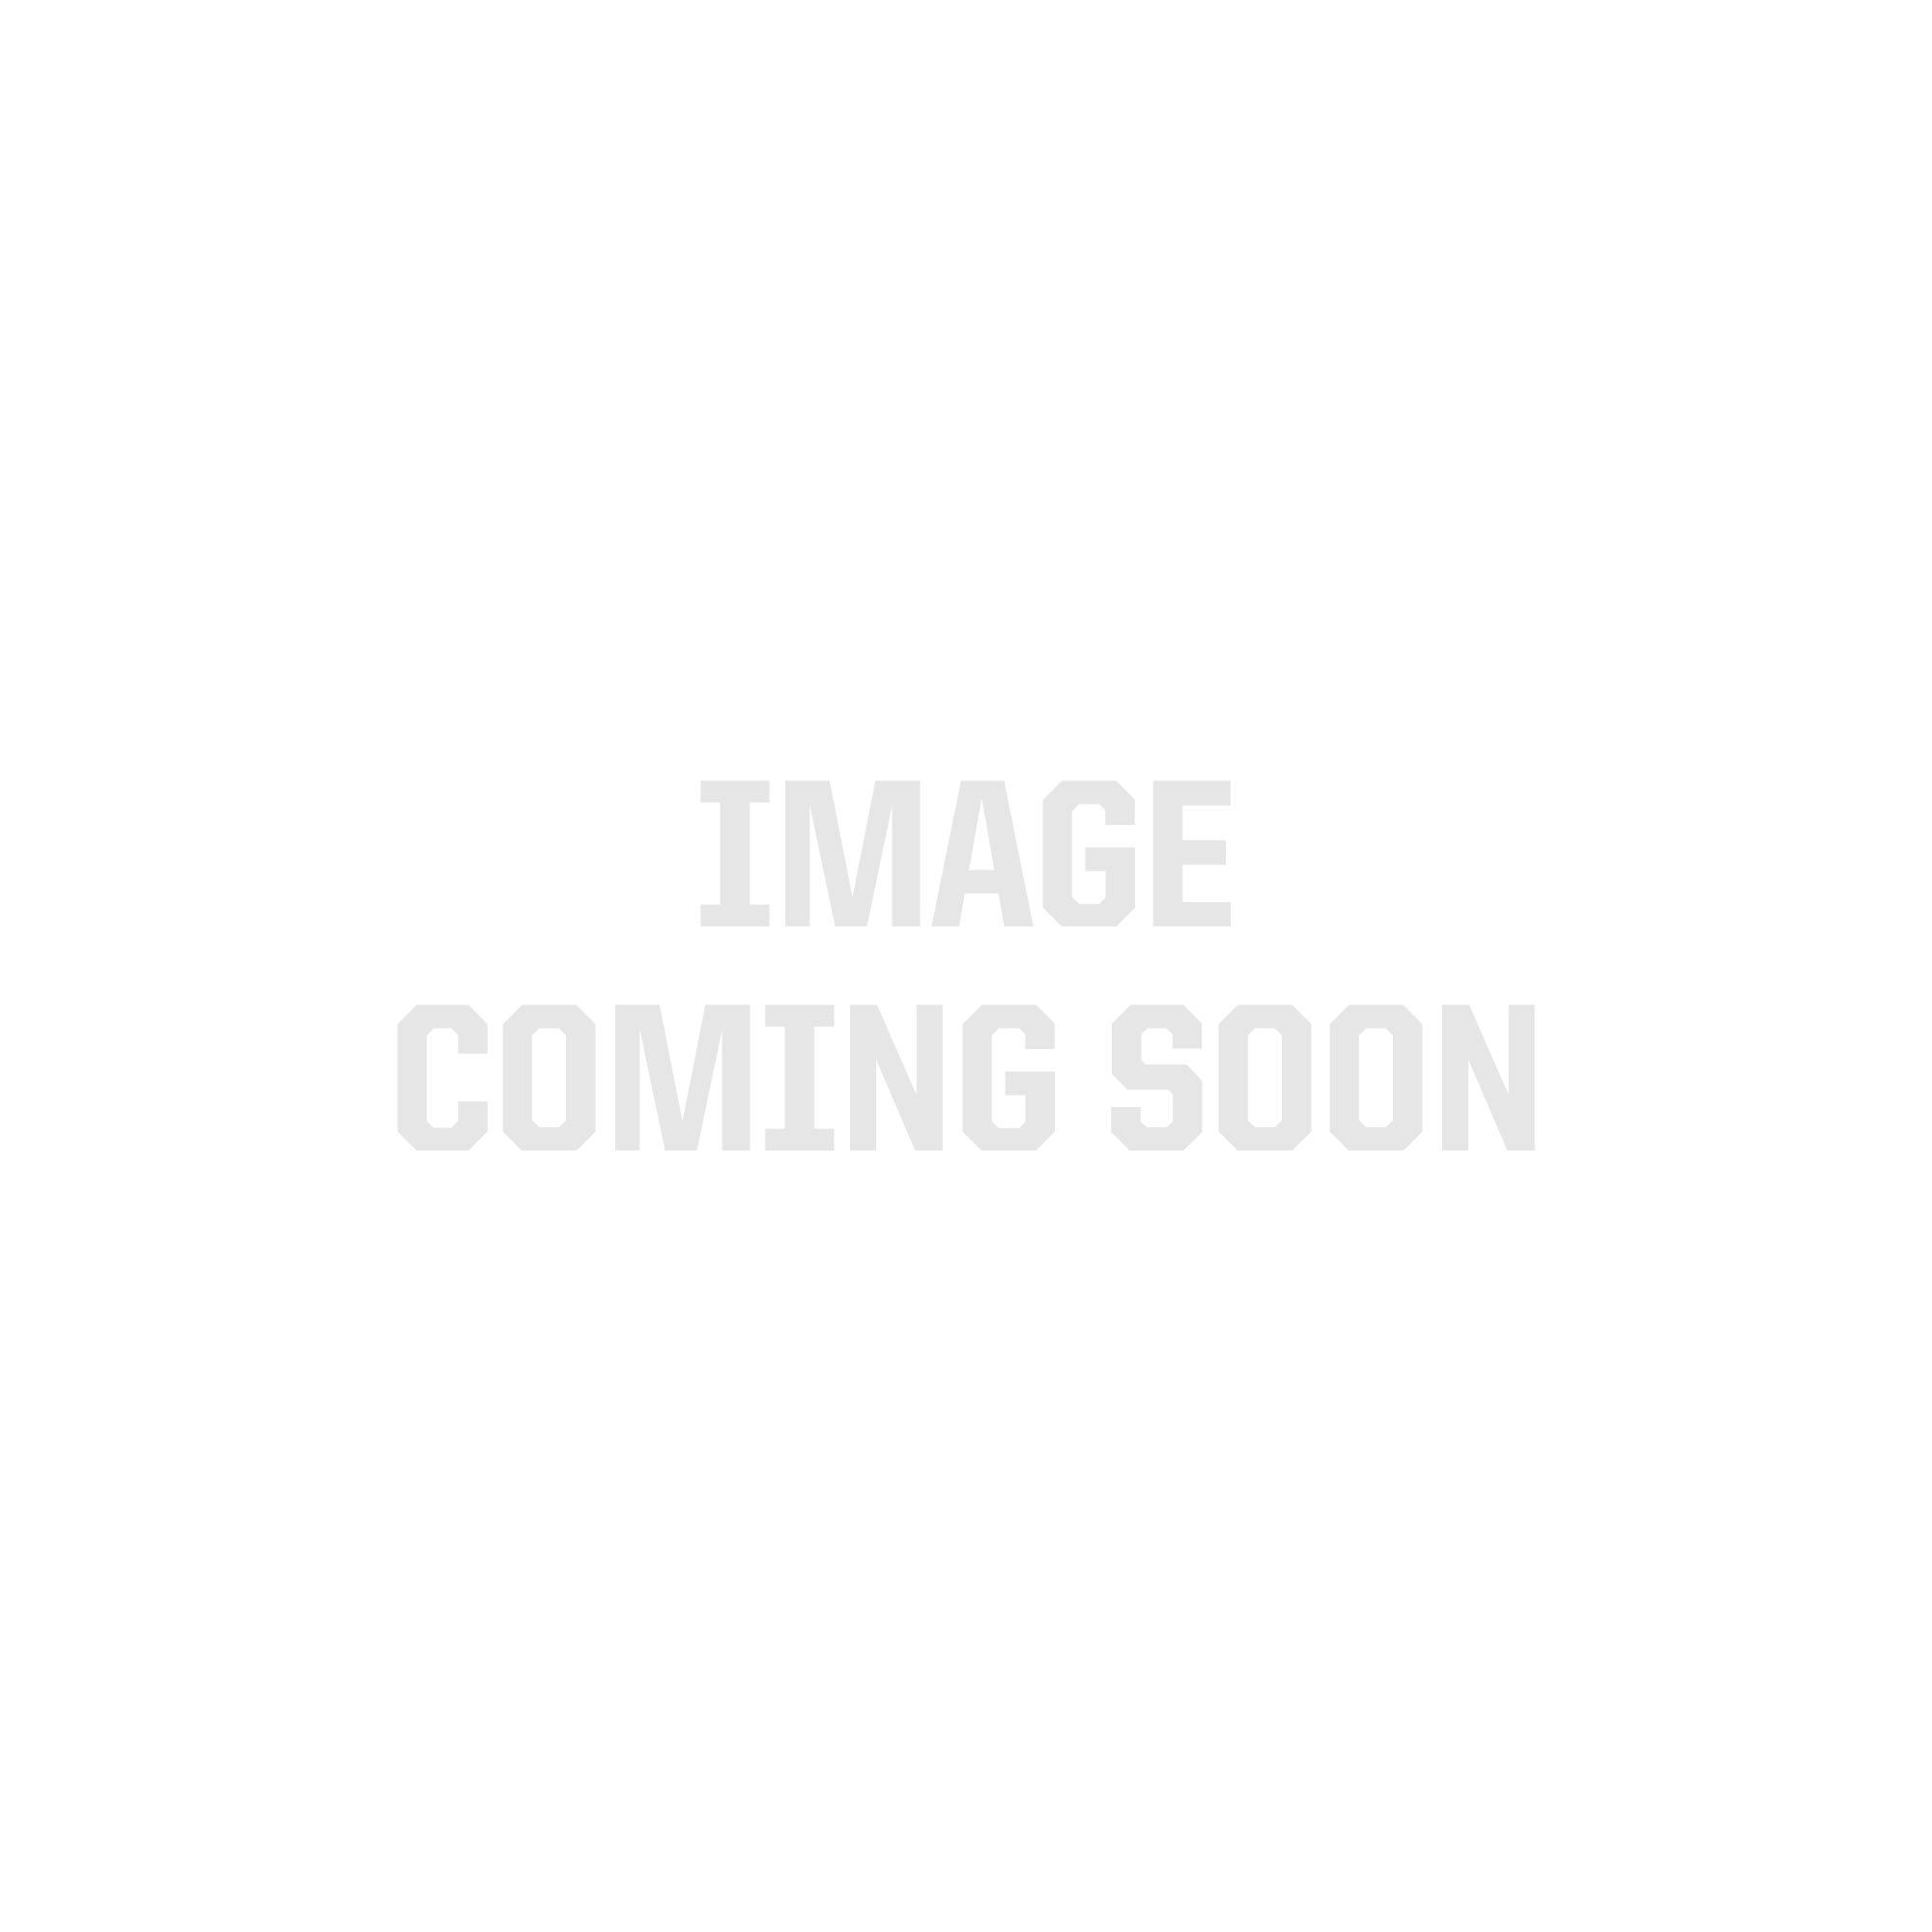 Women's Short Sleeve Performance Tee